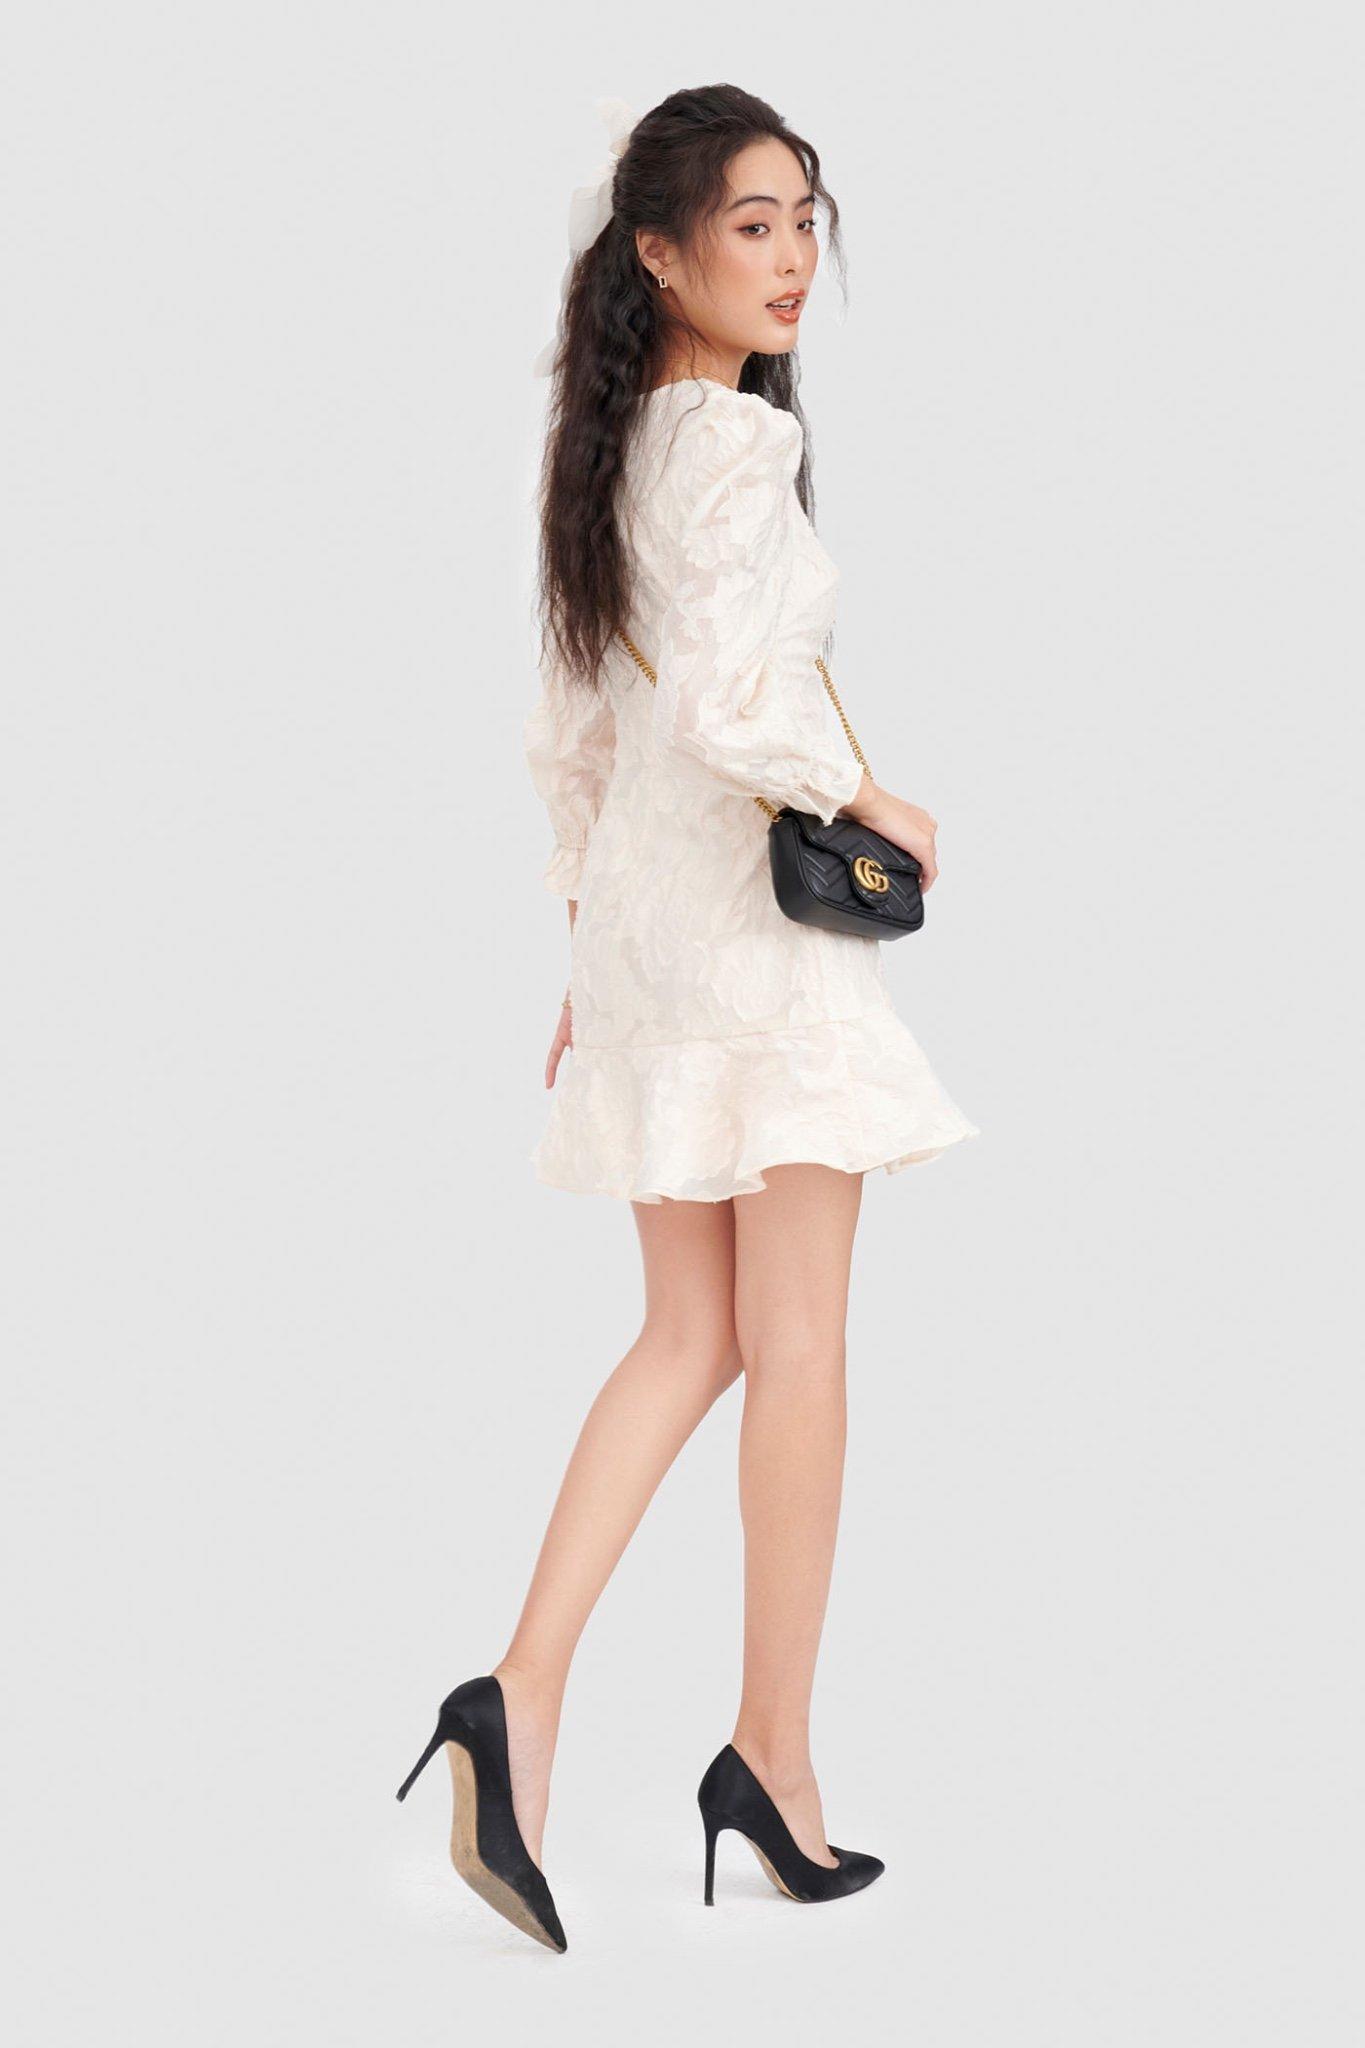 Đầm hạ eo mini hoạ tiết hoa dập nổi